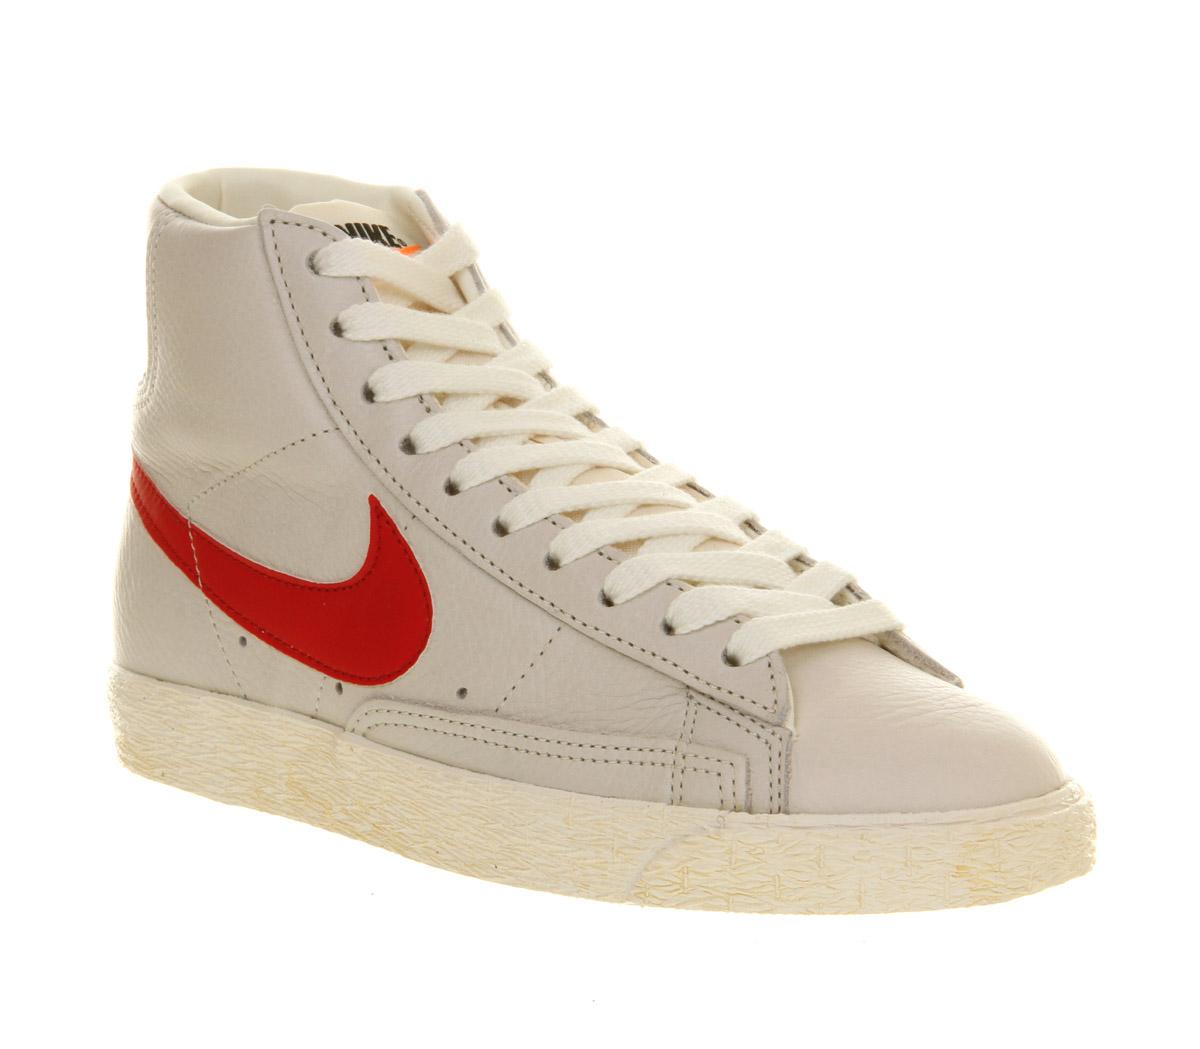 Nike Blazer Messenger Cuir Cru Salut